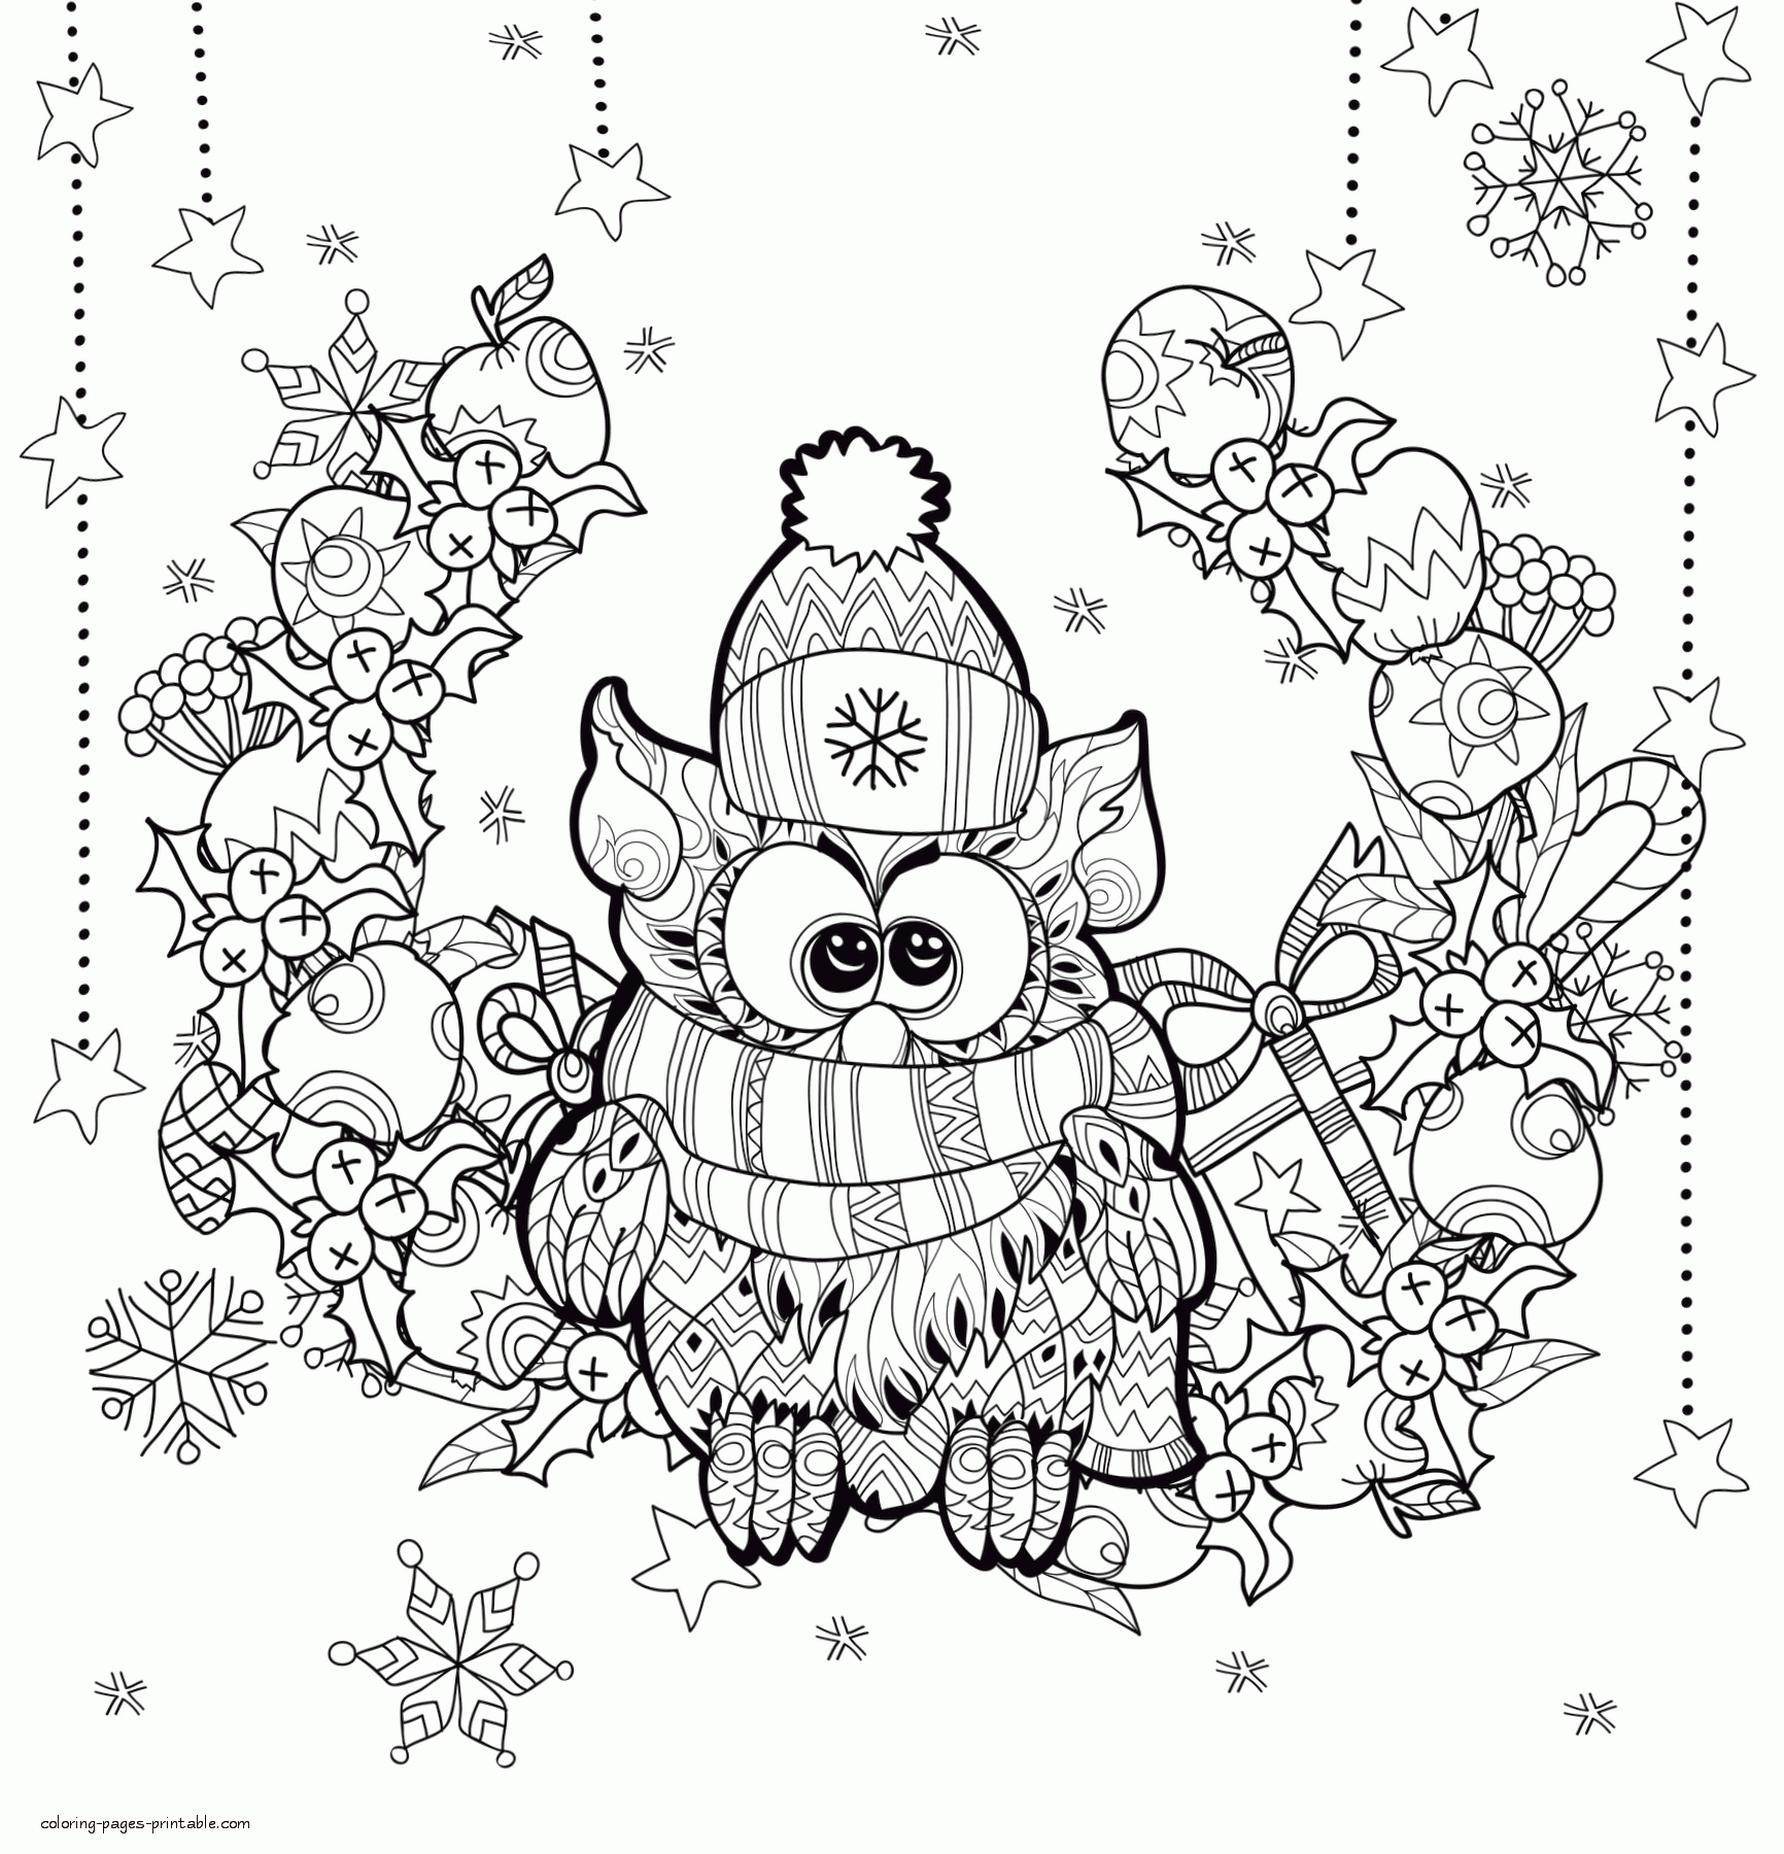 Adult Christmas Coloring Pages Free to Print Christmas Owl vdr8